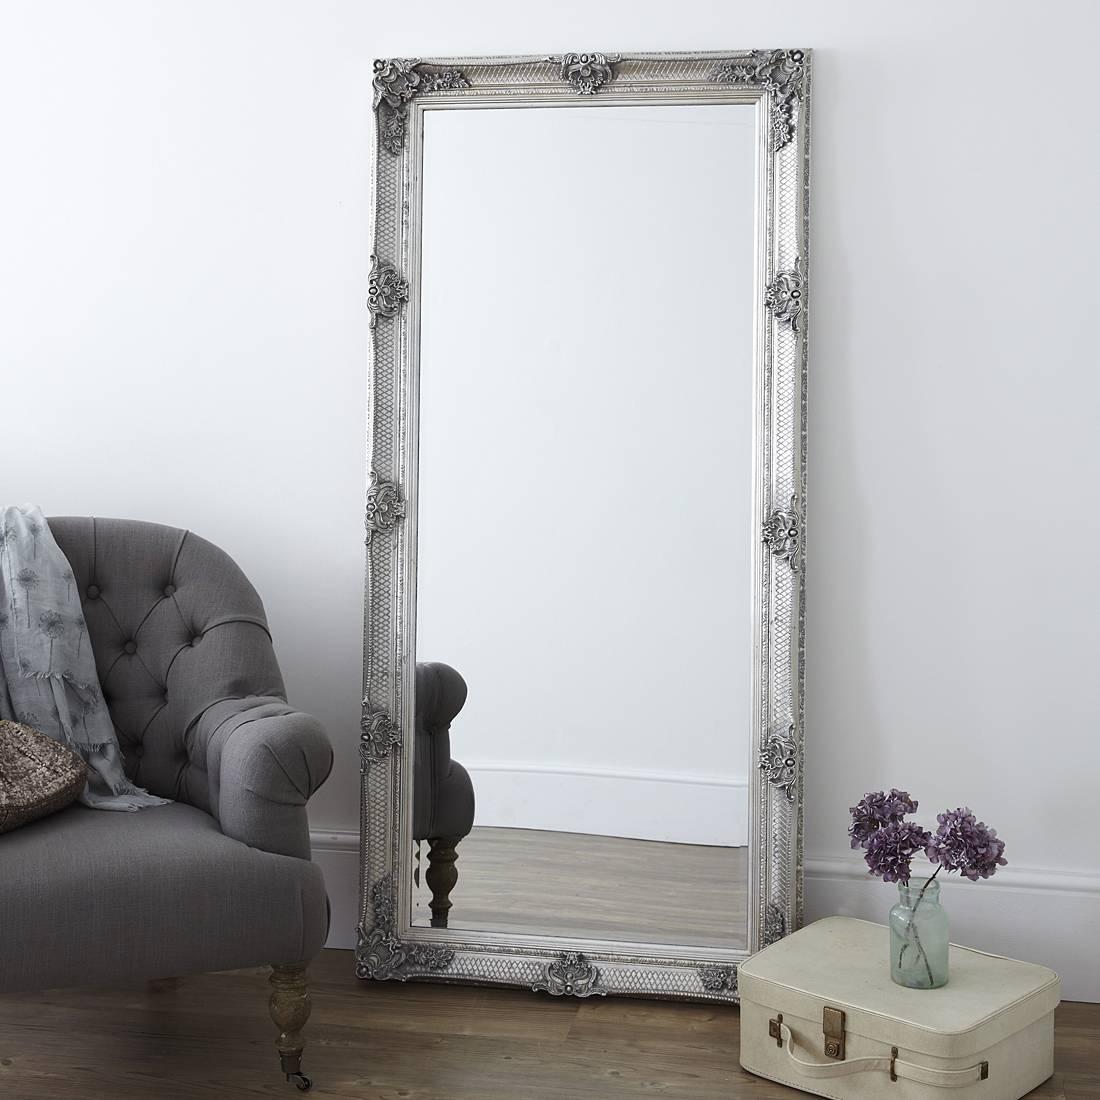 Decorative Antique Silver Full Length Mirror – Primrose & Plum with regard to Floor Dressing Mirrors (Image 3 of 15)